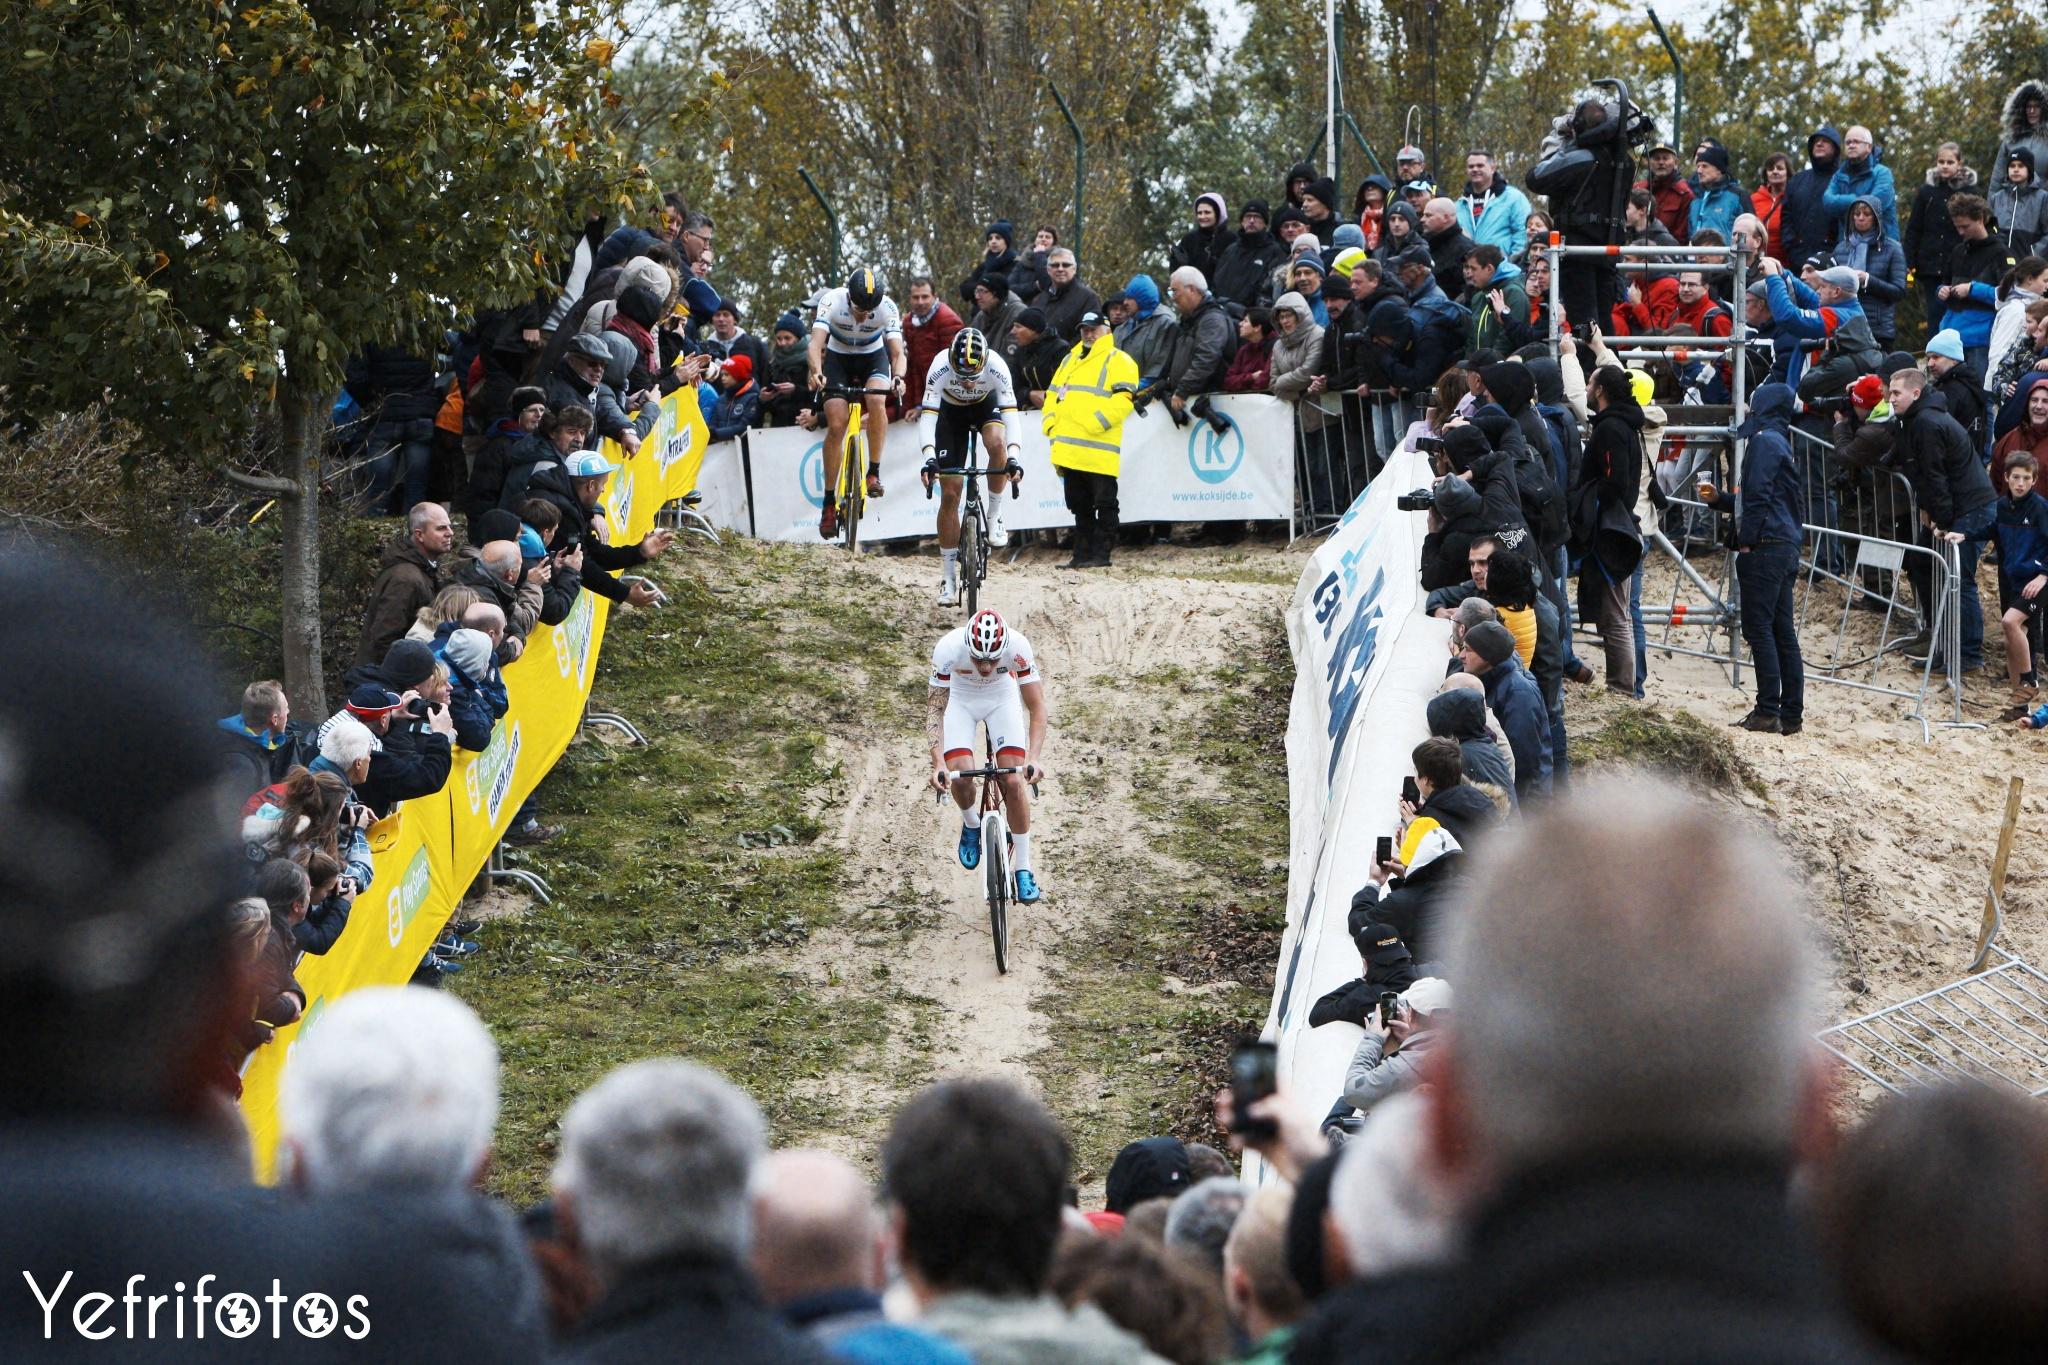 Koksijde - UCI Cyclocross World Cup - Mathieu van der Poel - Foule